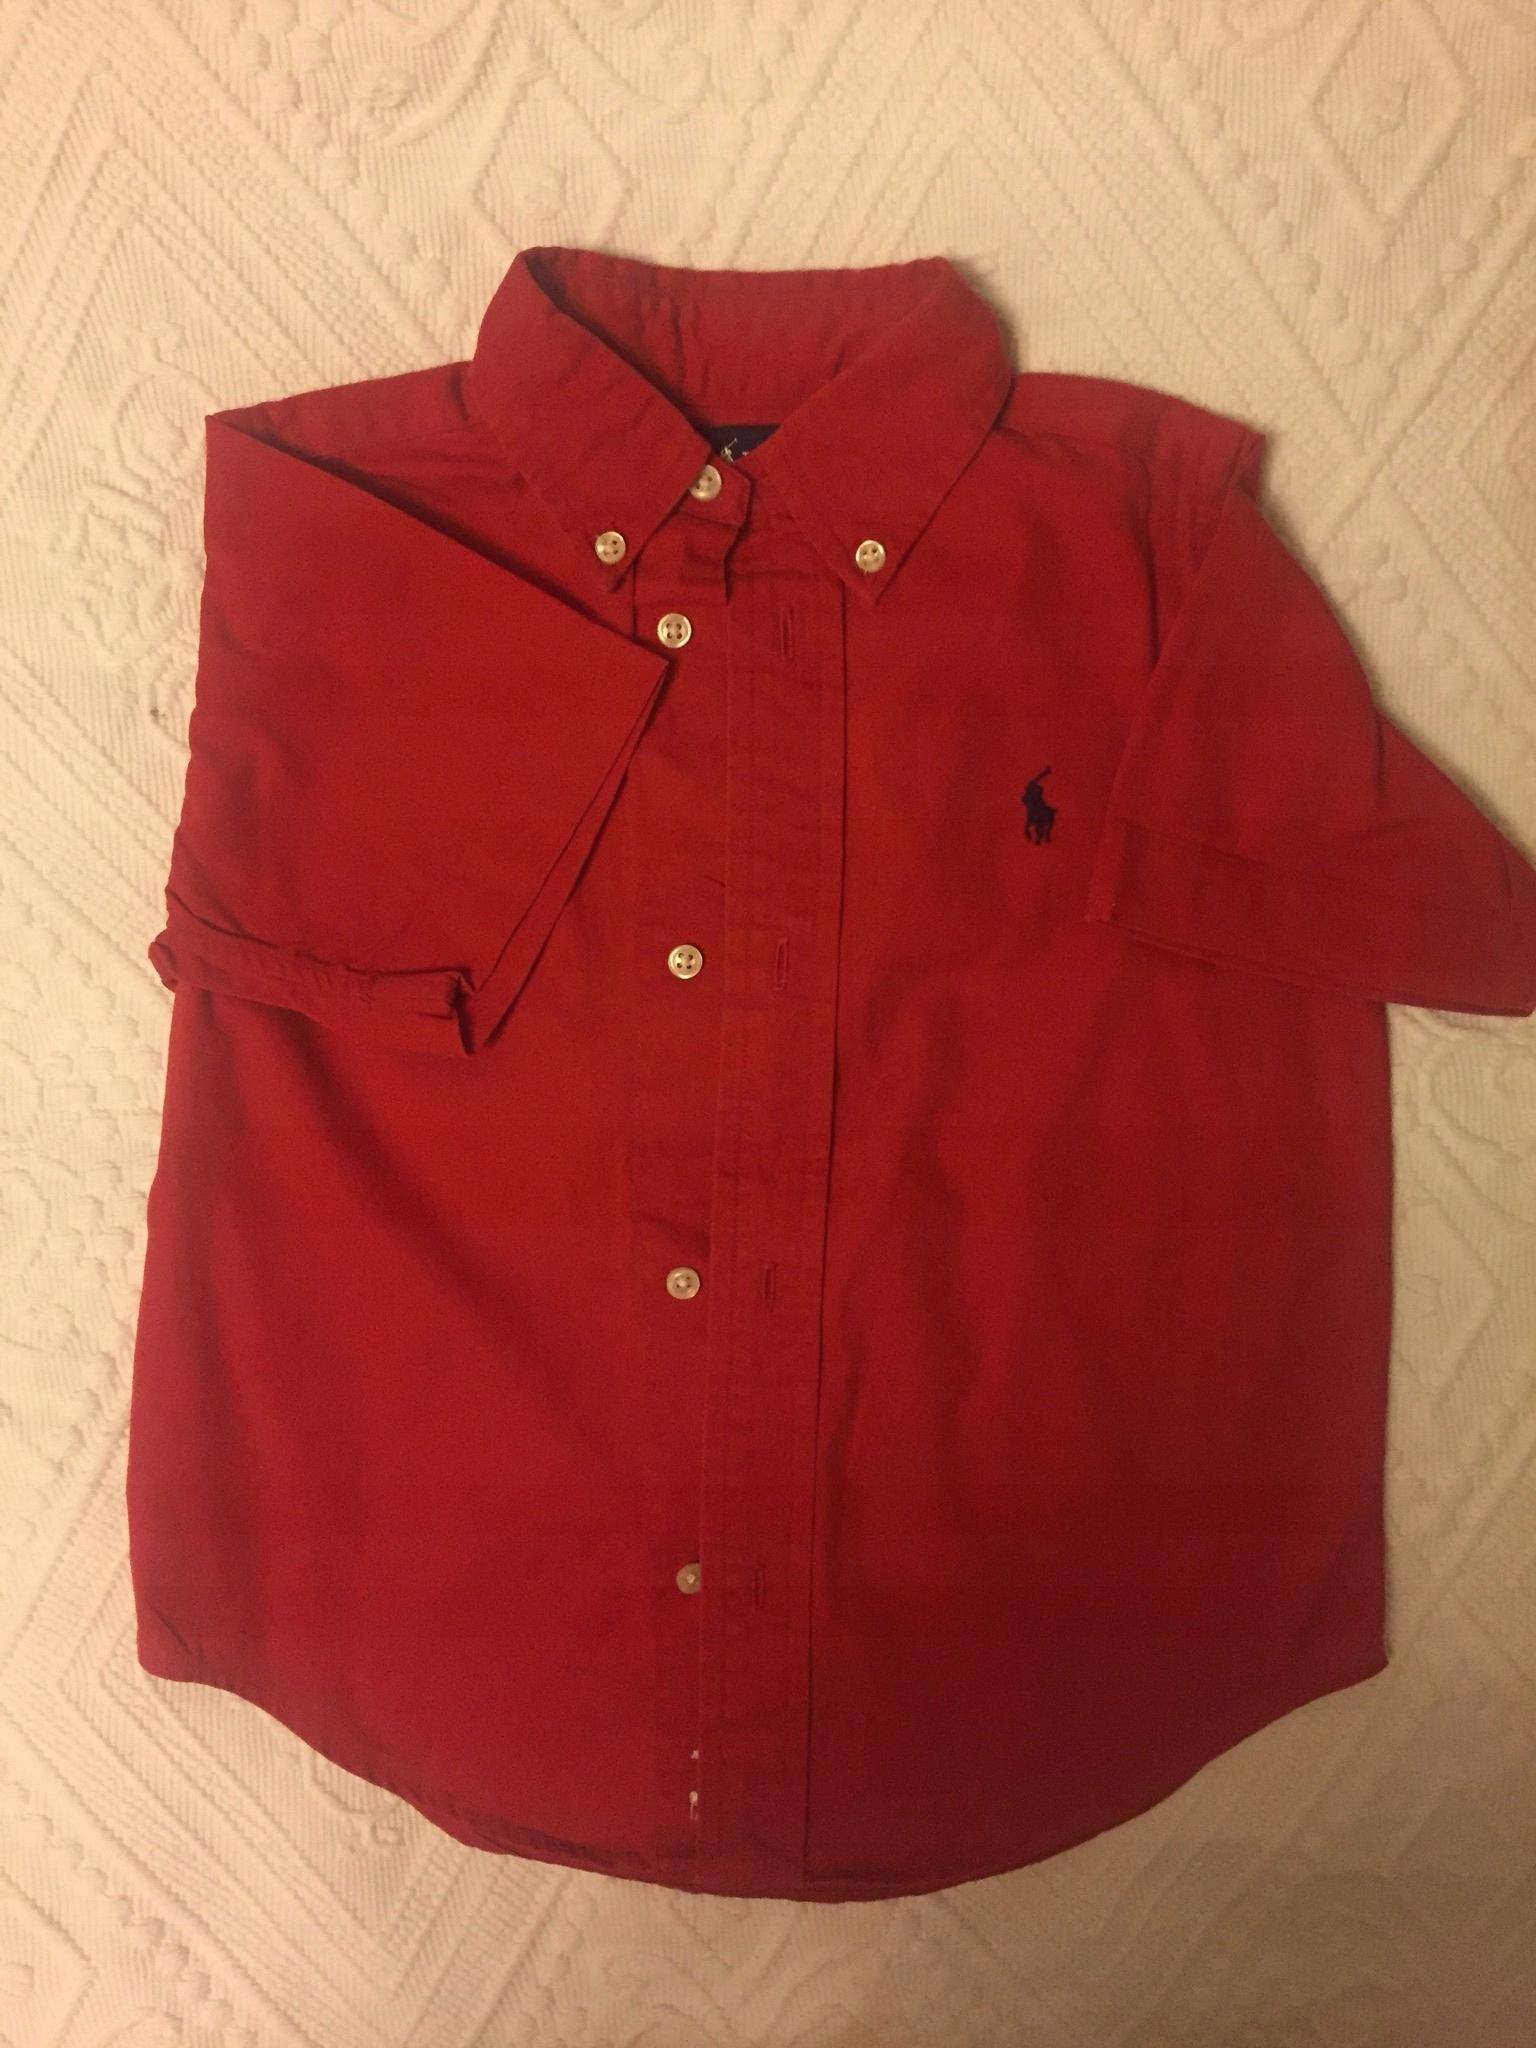 96b7f86d4 Koszula chłopięca Ralph Lauren - 7516703182 - oficjalne archiwum ...